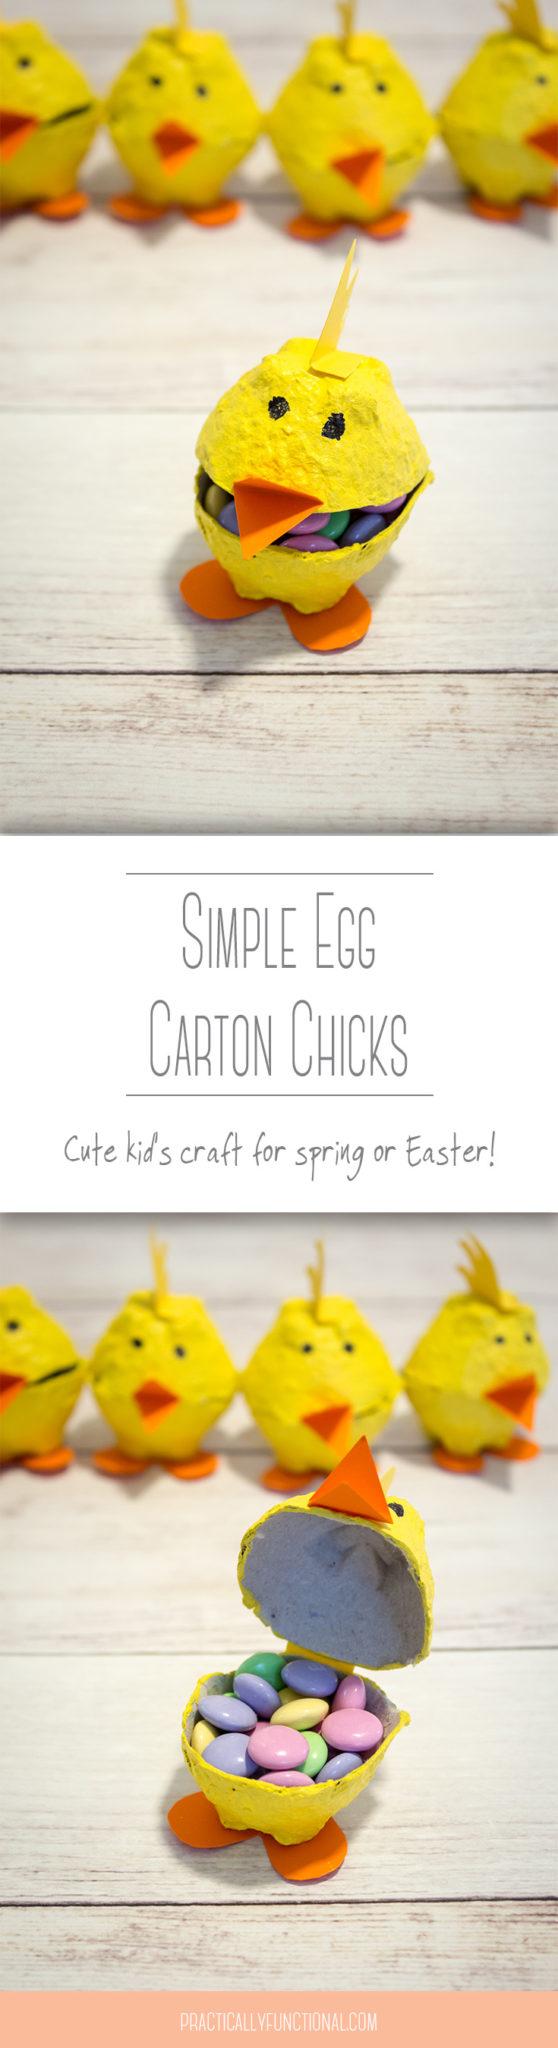 Simple egg carton chicks